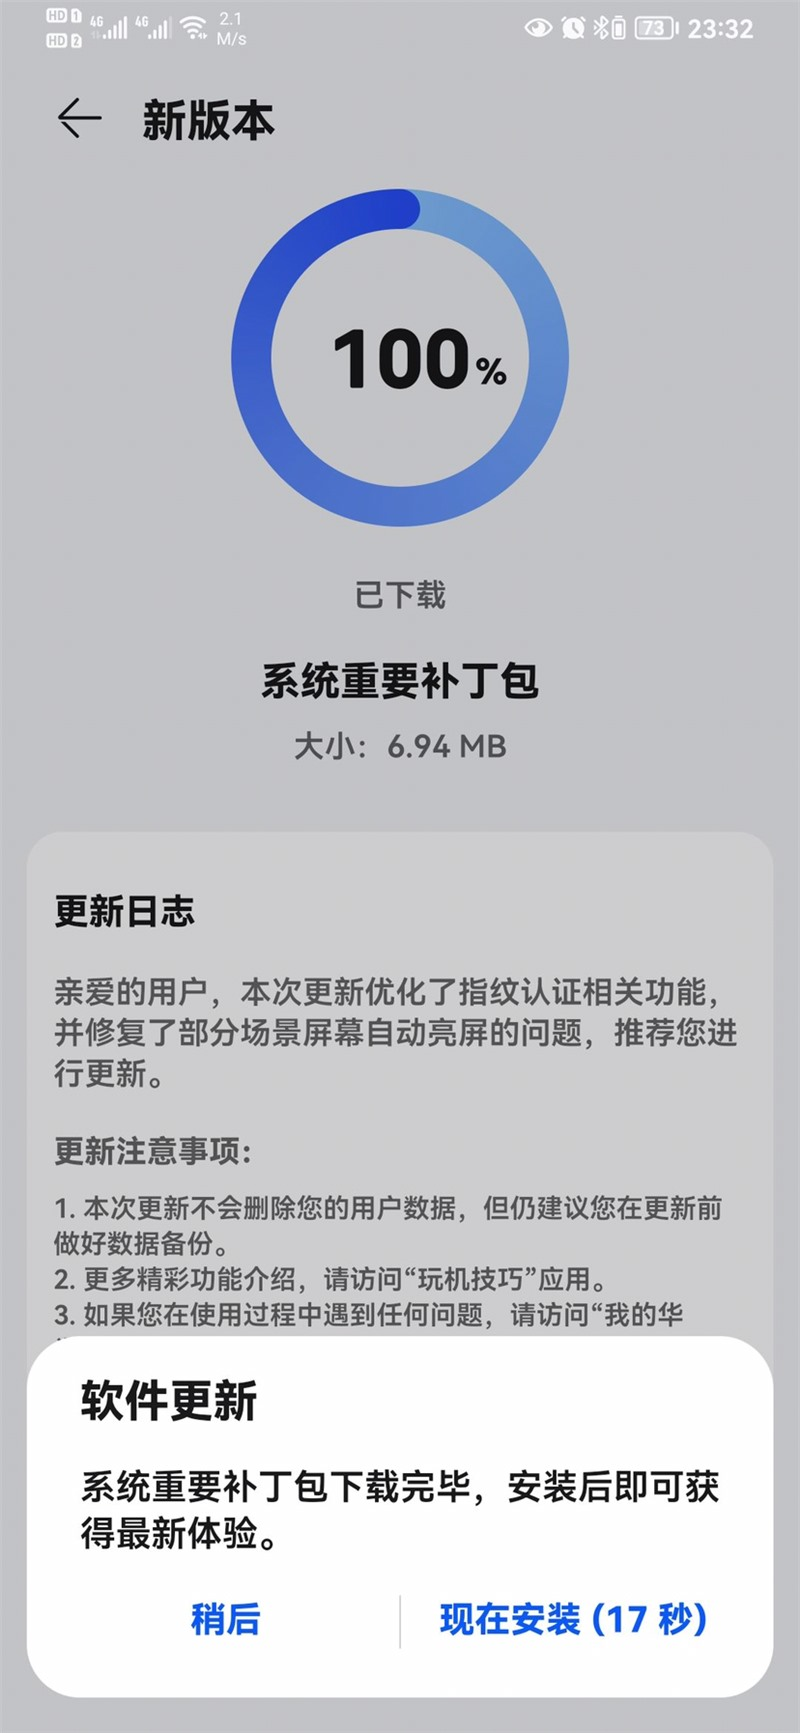 Huawei P30 HarmonyOS patch update